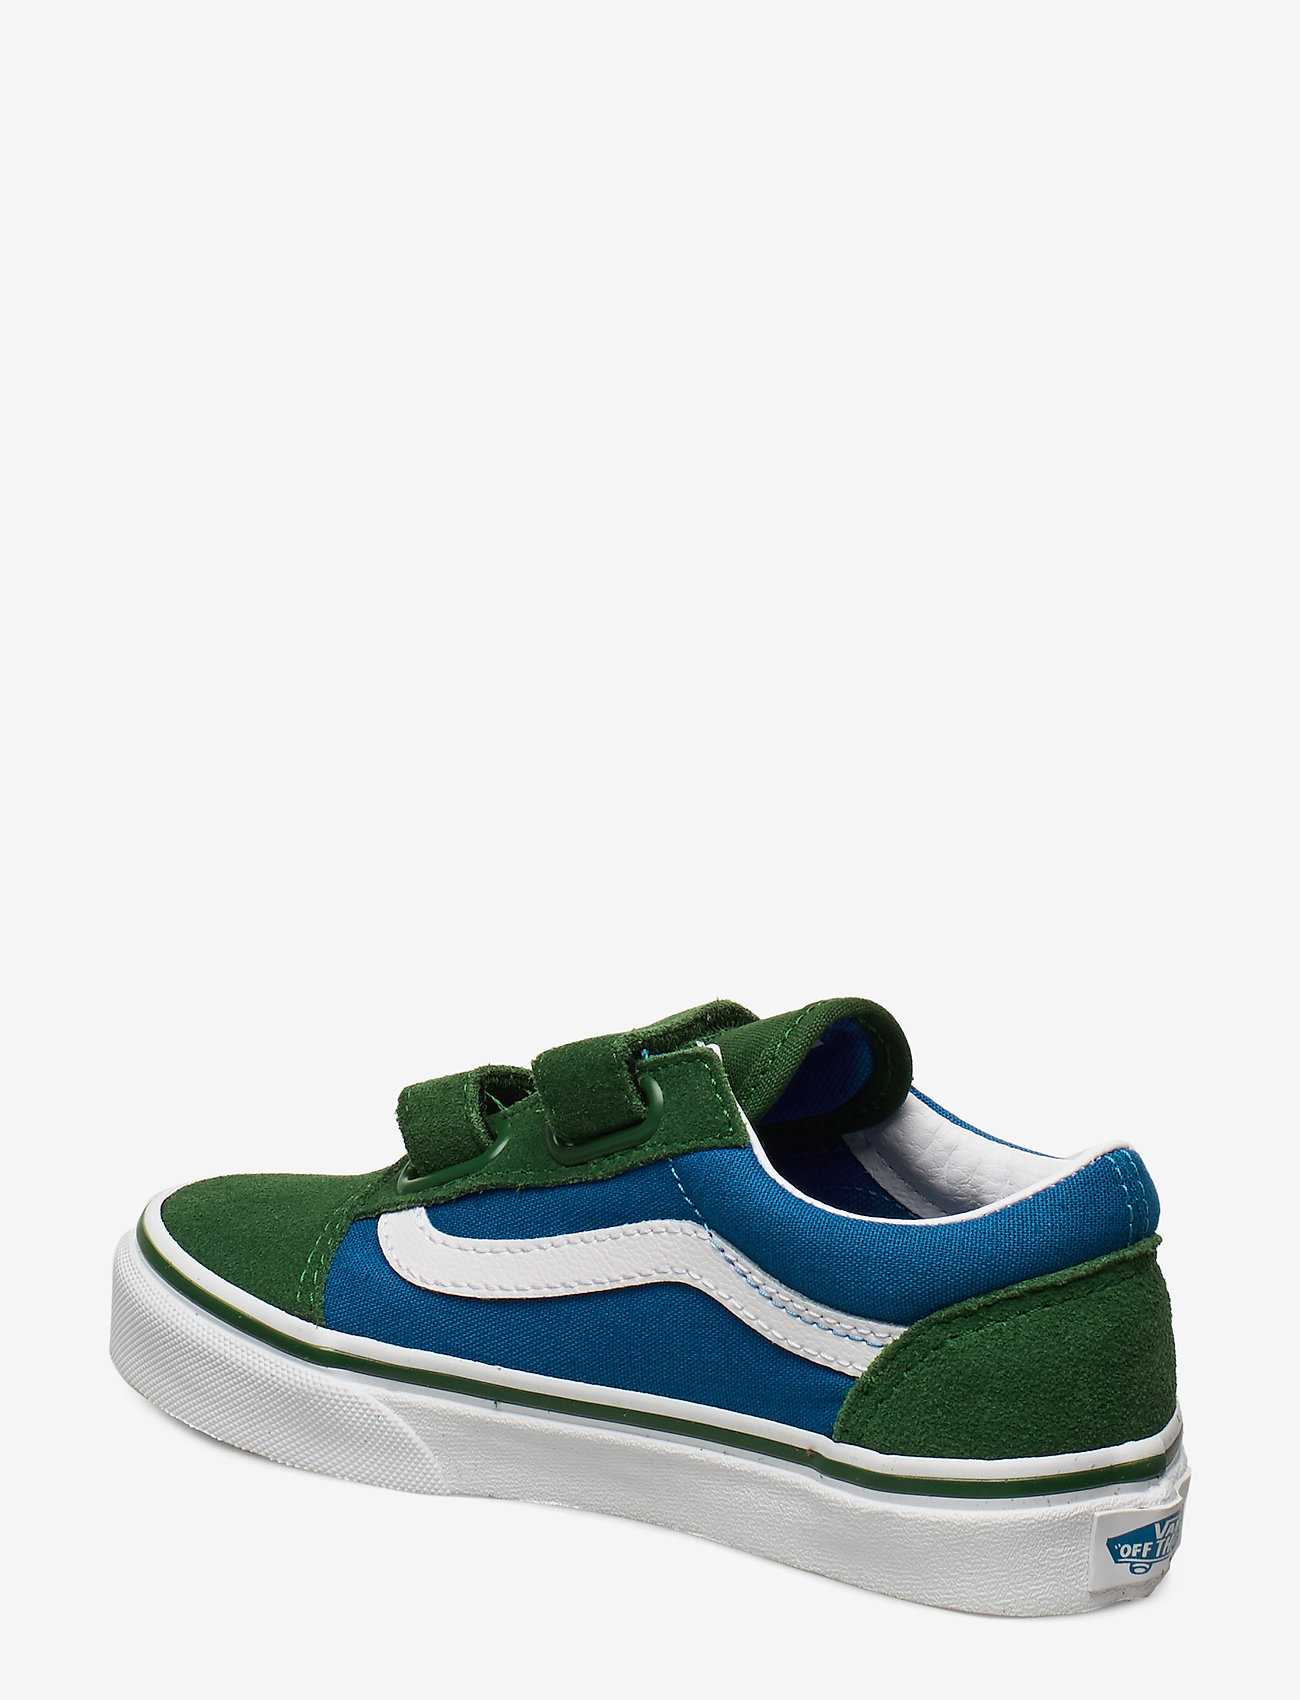 Vans Uy Old Skool V - Sneakers (2-tone)mdtrnbl/grnrpstrs